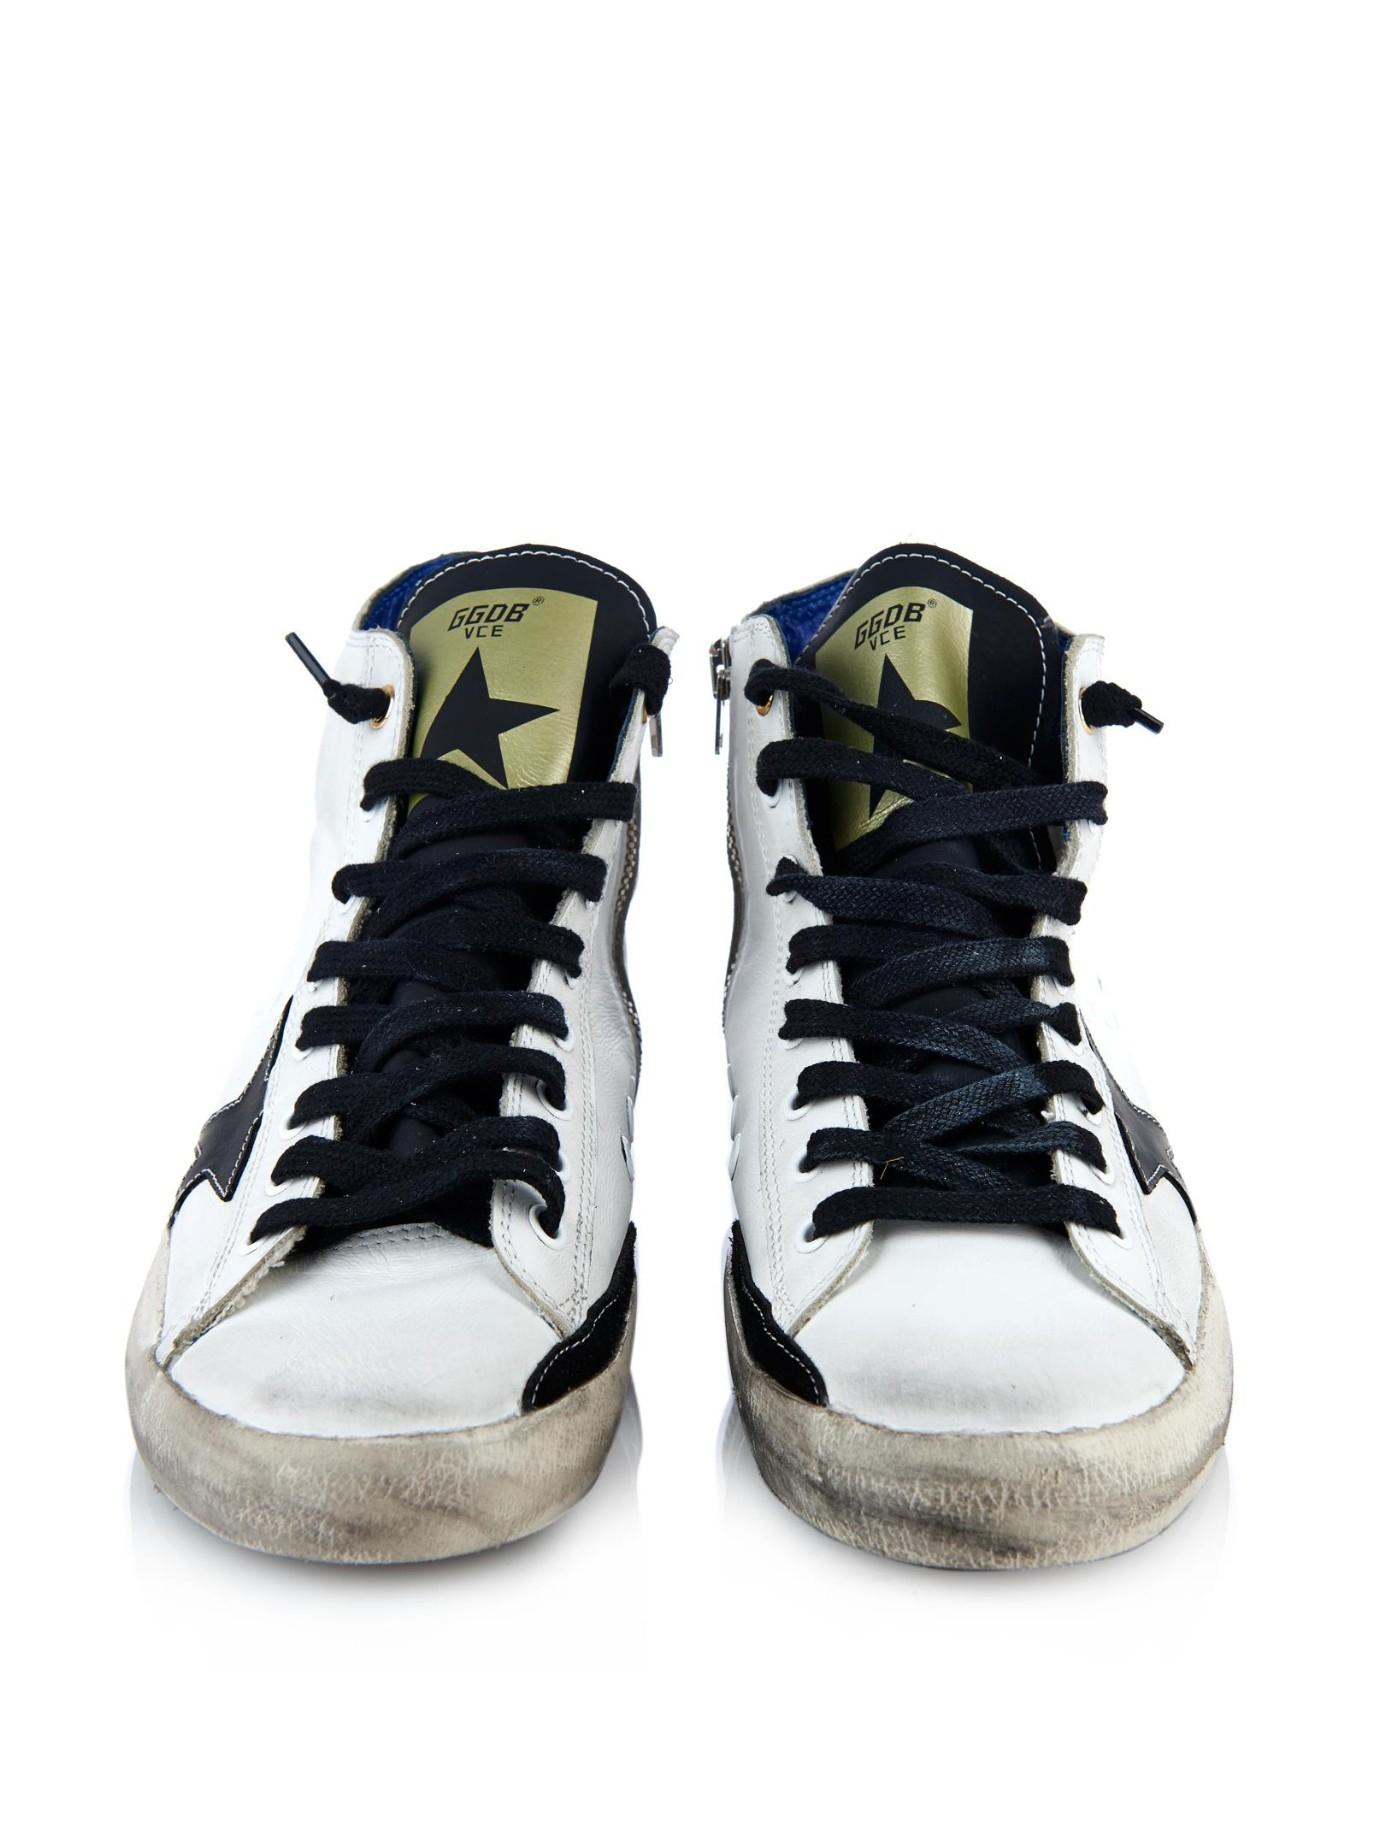 Golden Goose Deluxe Brand Francy high-top leather sneakers outlet order online sale tumblr TJKbI0